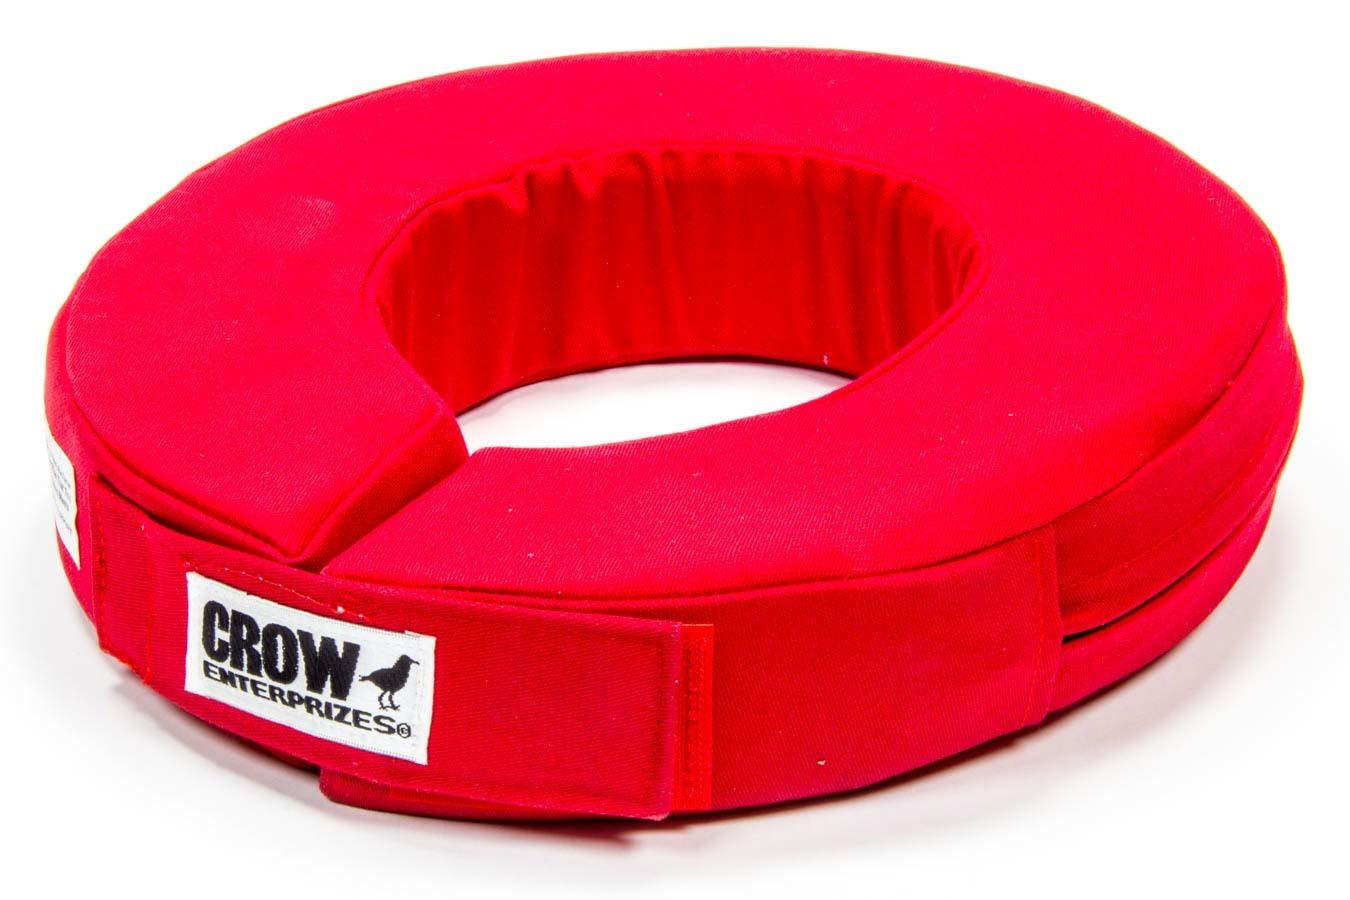 Crow Enterprizes Neck Collar Proban 360 Degree Red SFI 3.3